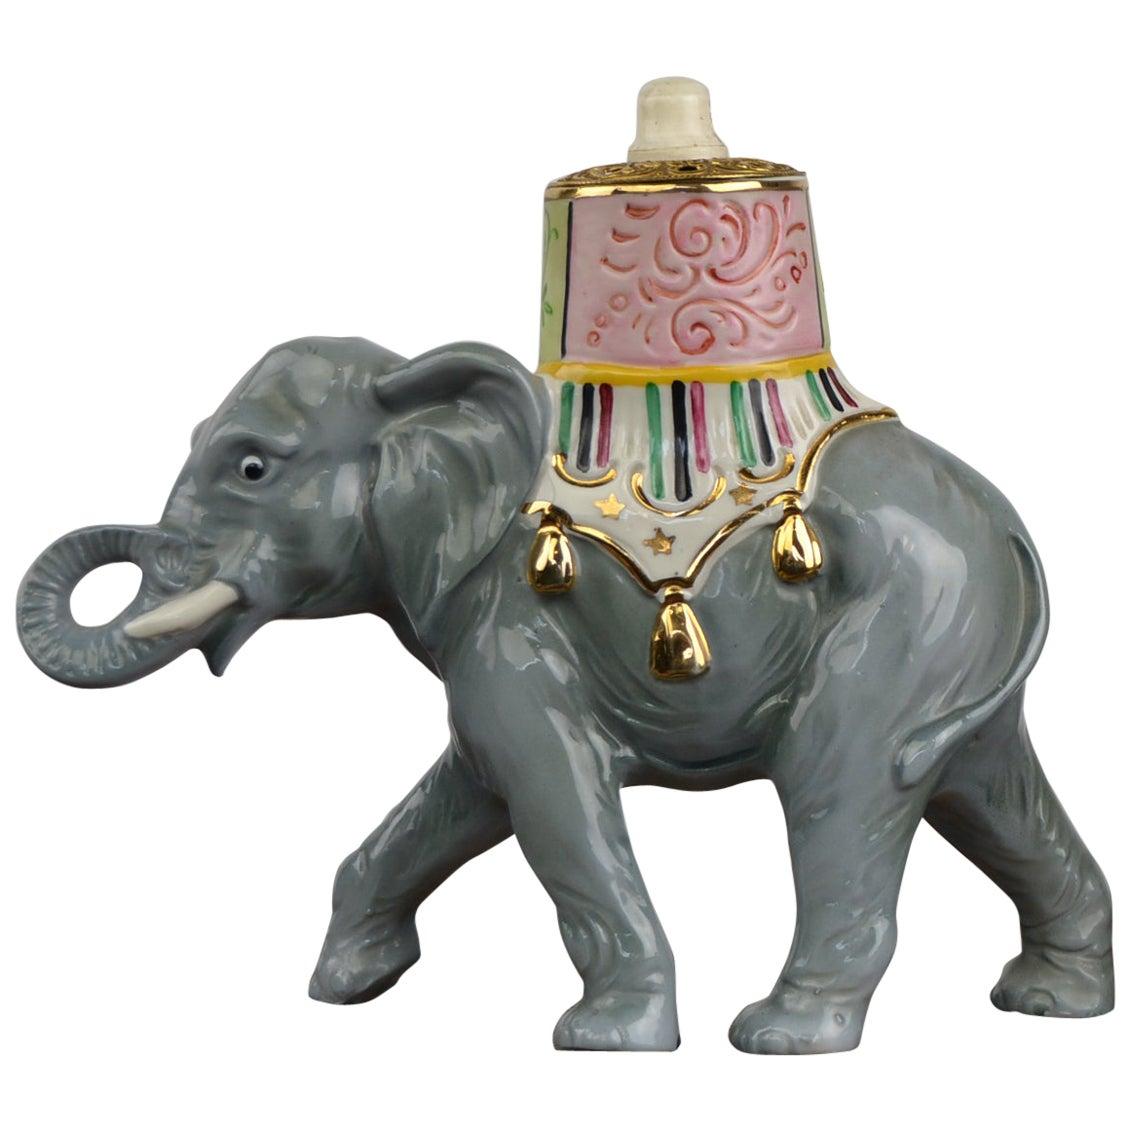 Porcelain Perfume Lamp Elephant Shaped , Germany , 1950s